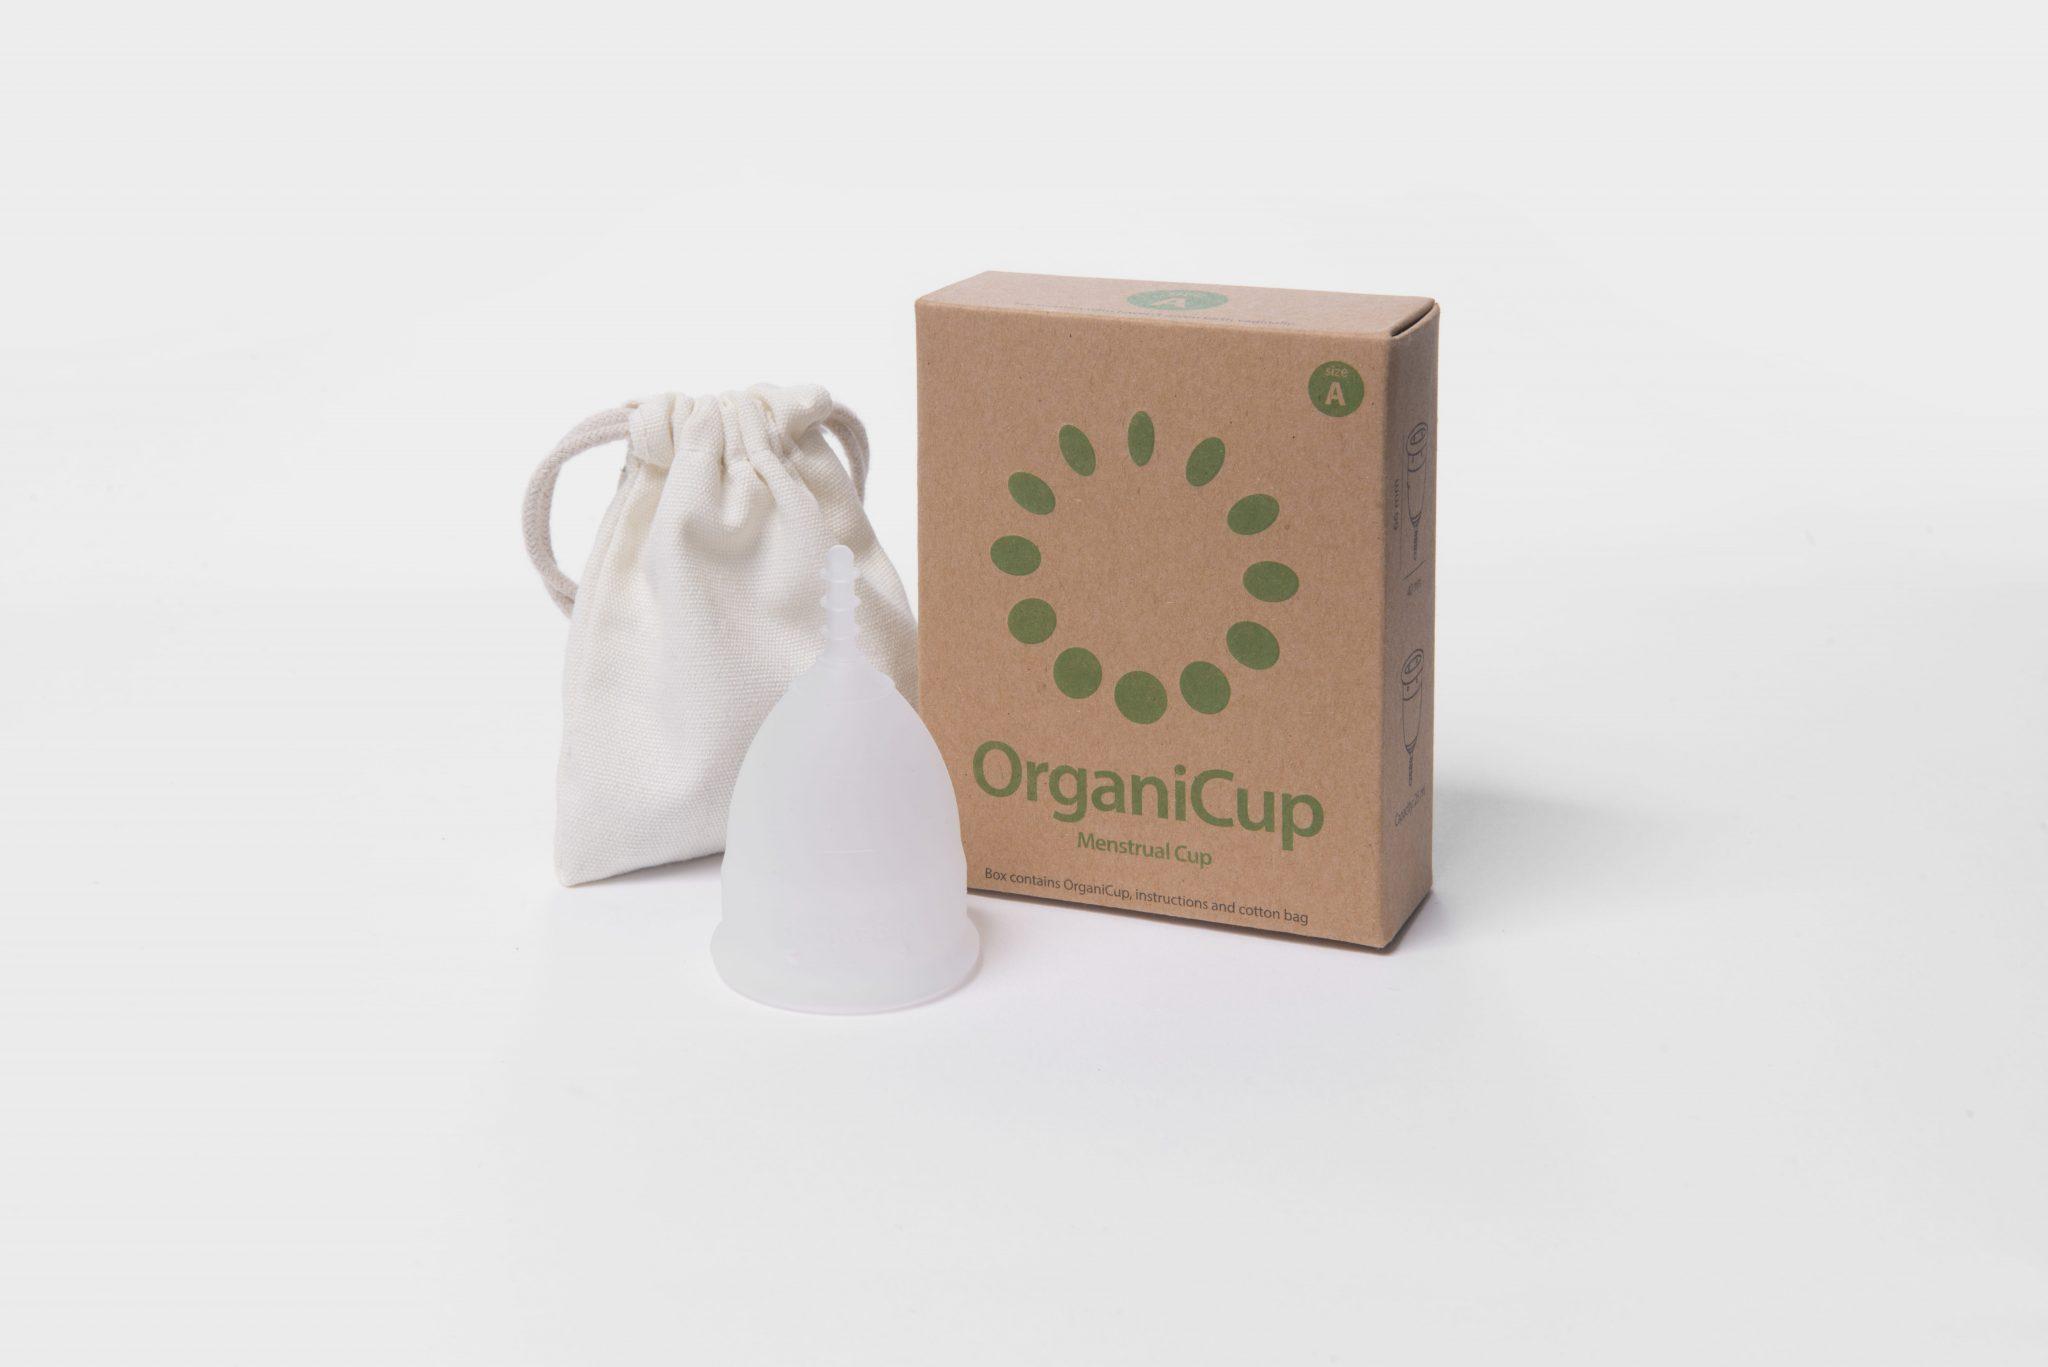 organicup, menstruatiecup, zero waste, bag-again